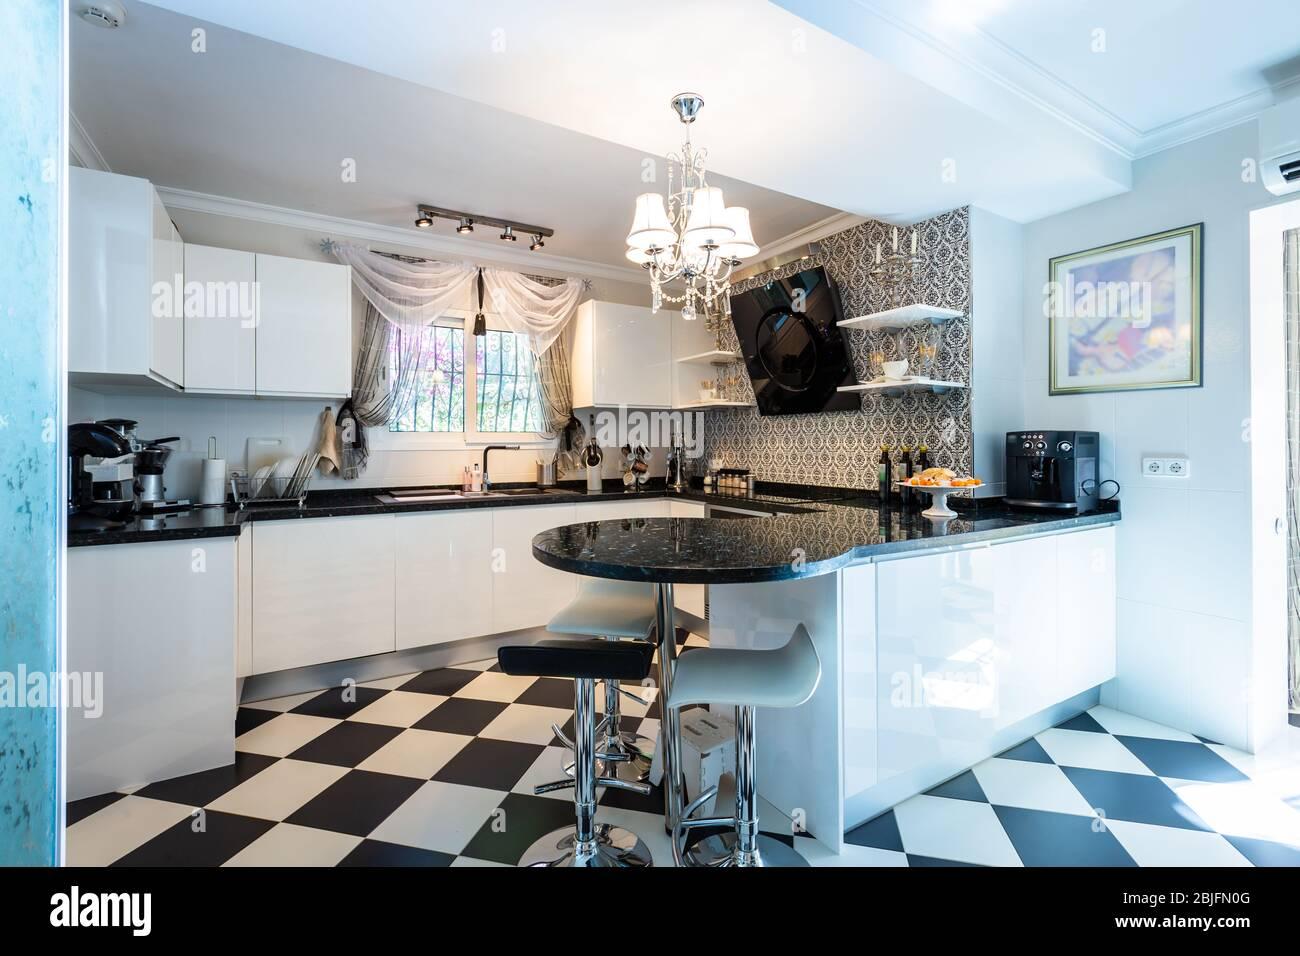 Stylish Kitchen In Black And White Tones Black And White Marble Kitchen Equipment Soft Light Stock Photo Alamy